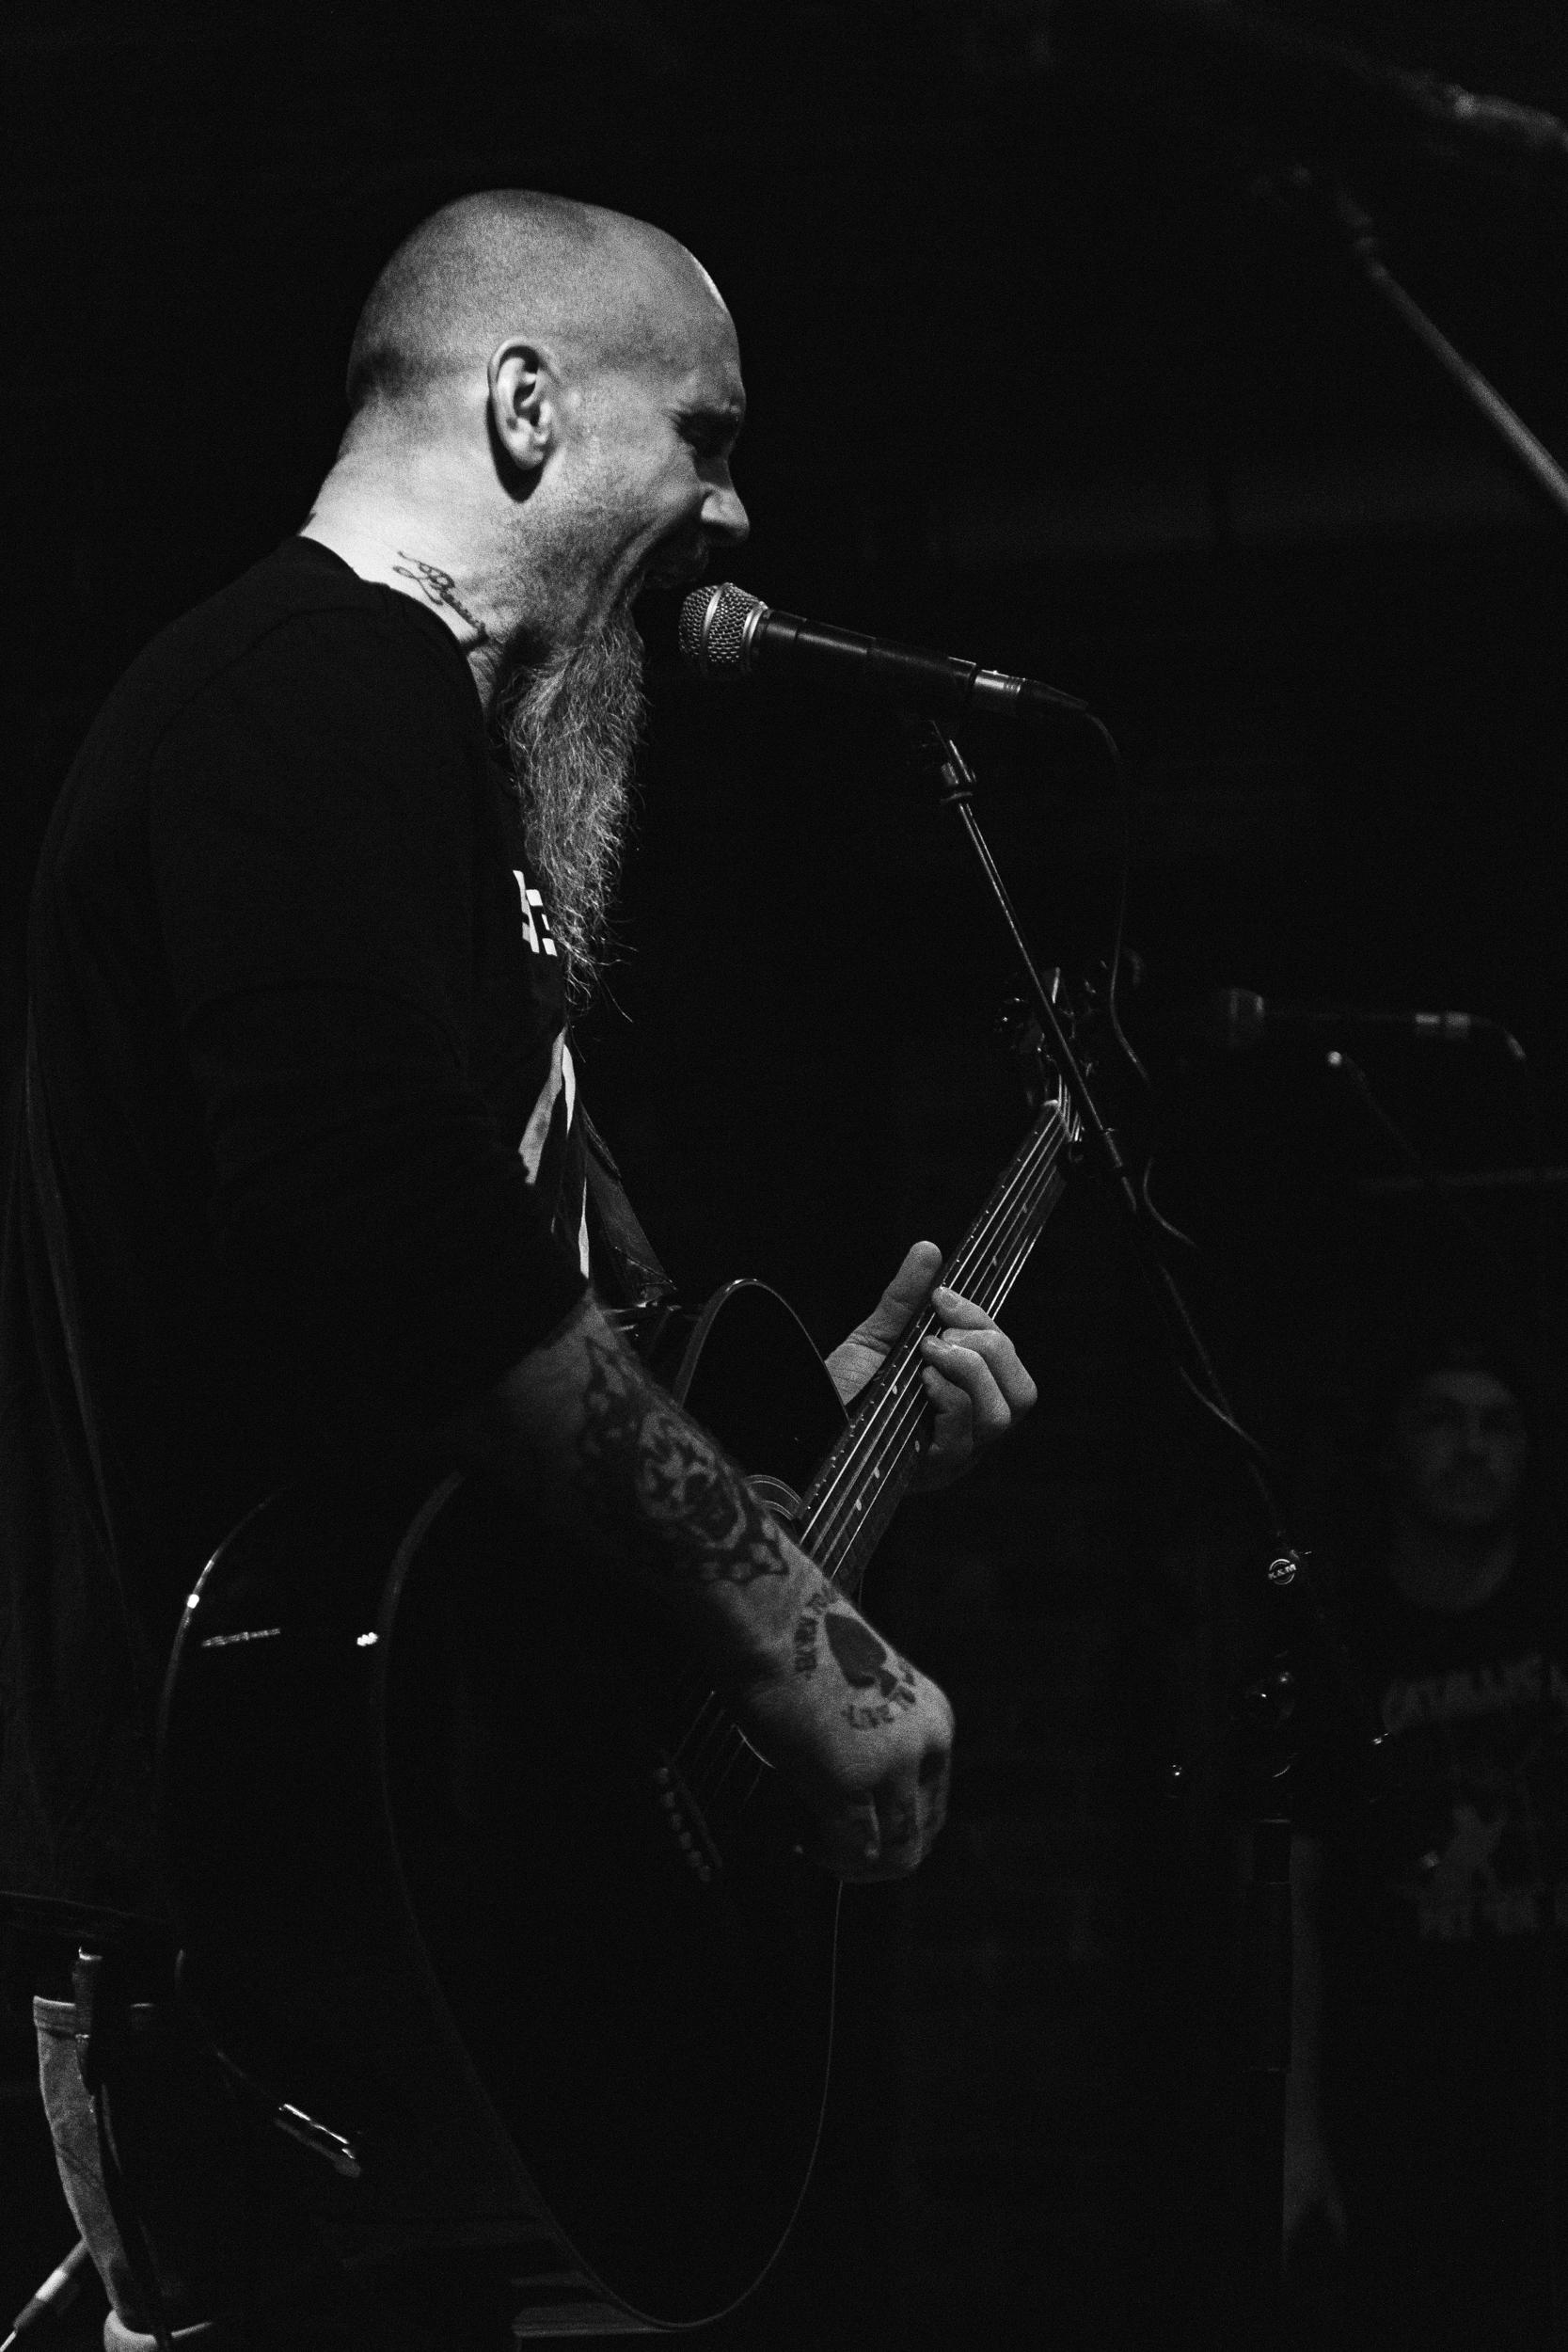 Nick O Acoustic_CherryBar-4887.jpg